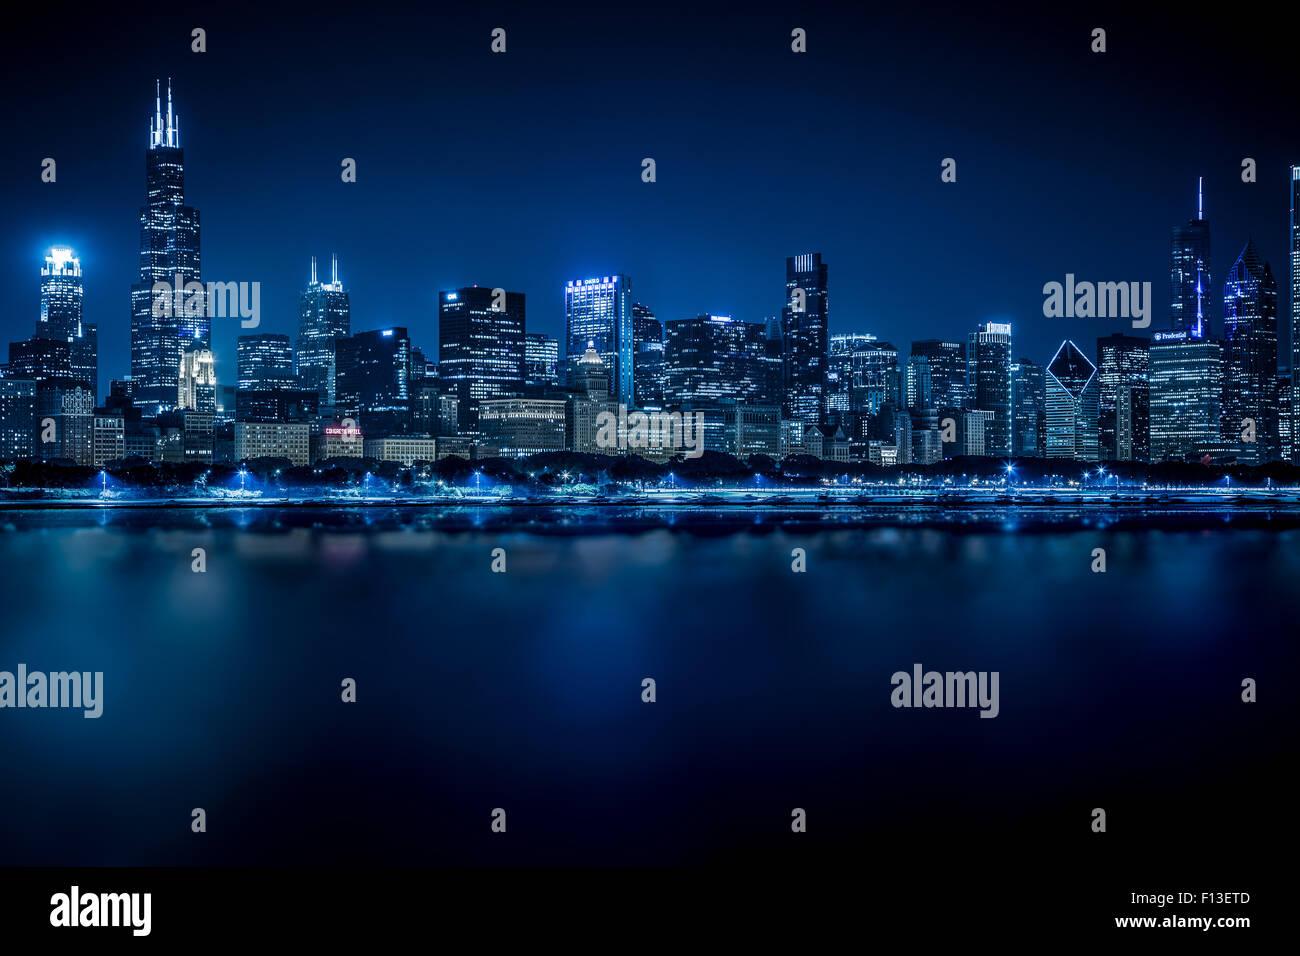 Chicago skyline at Night, Illinois, USA - Stock Image